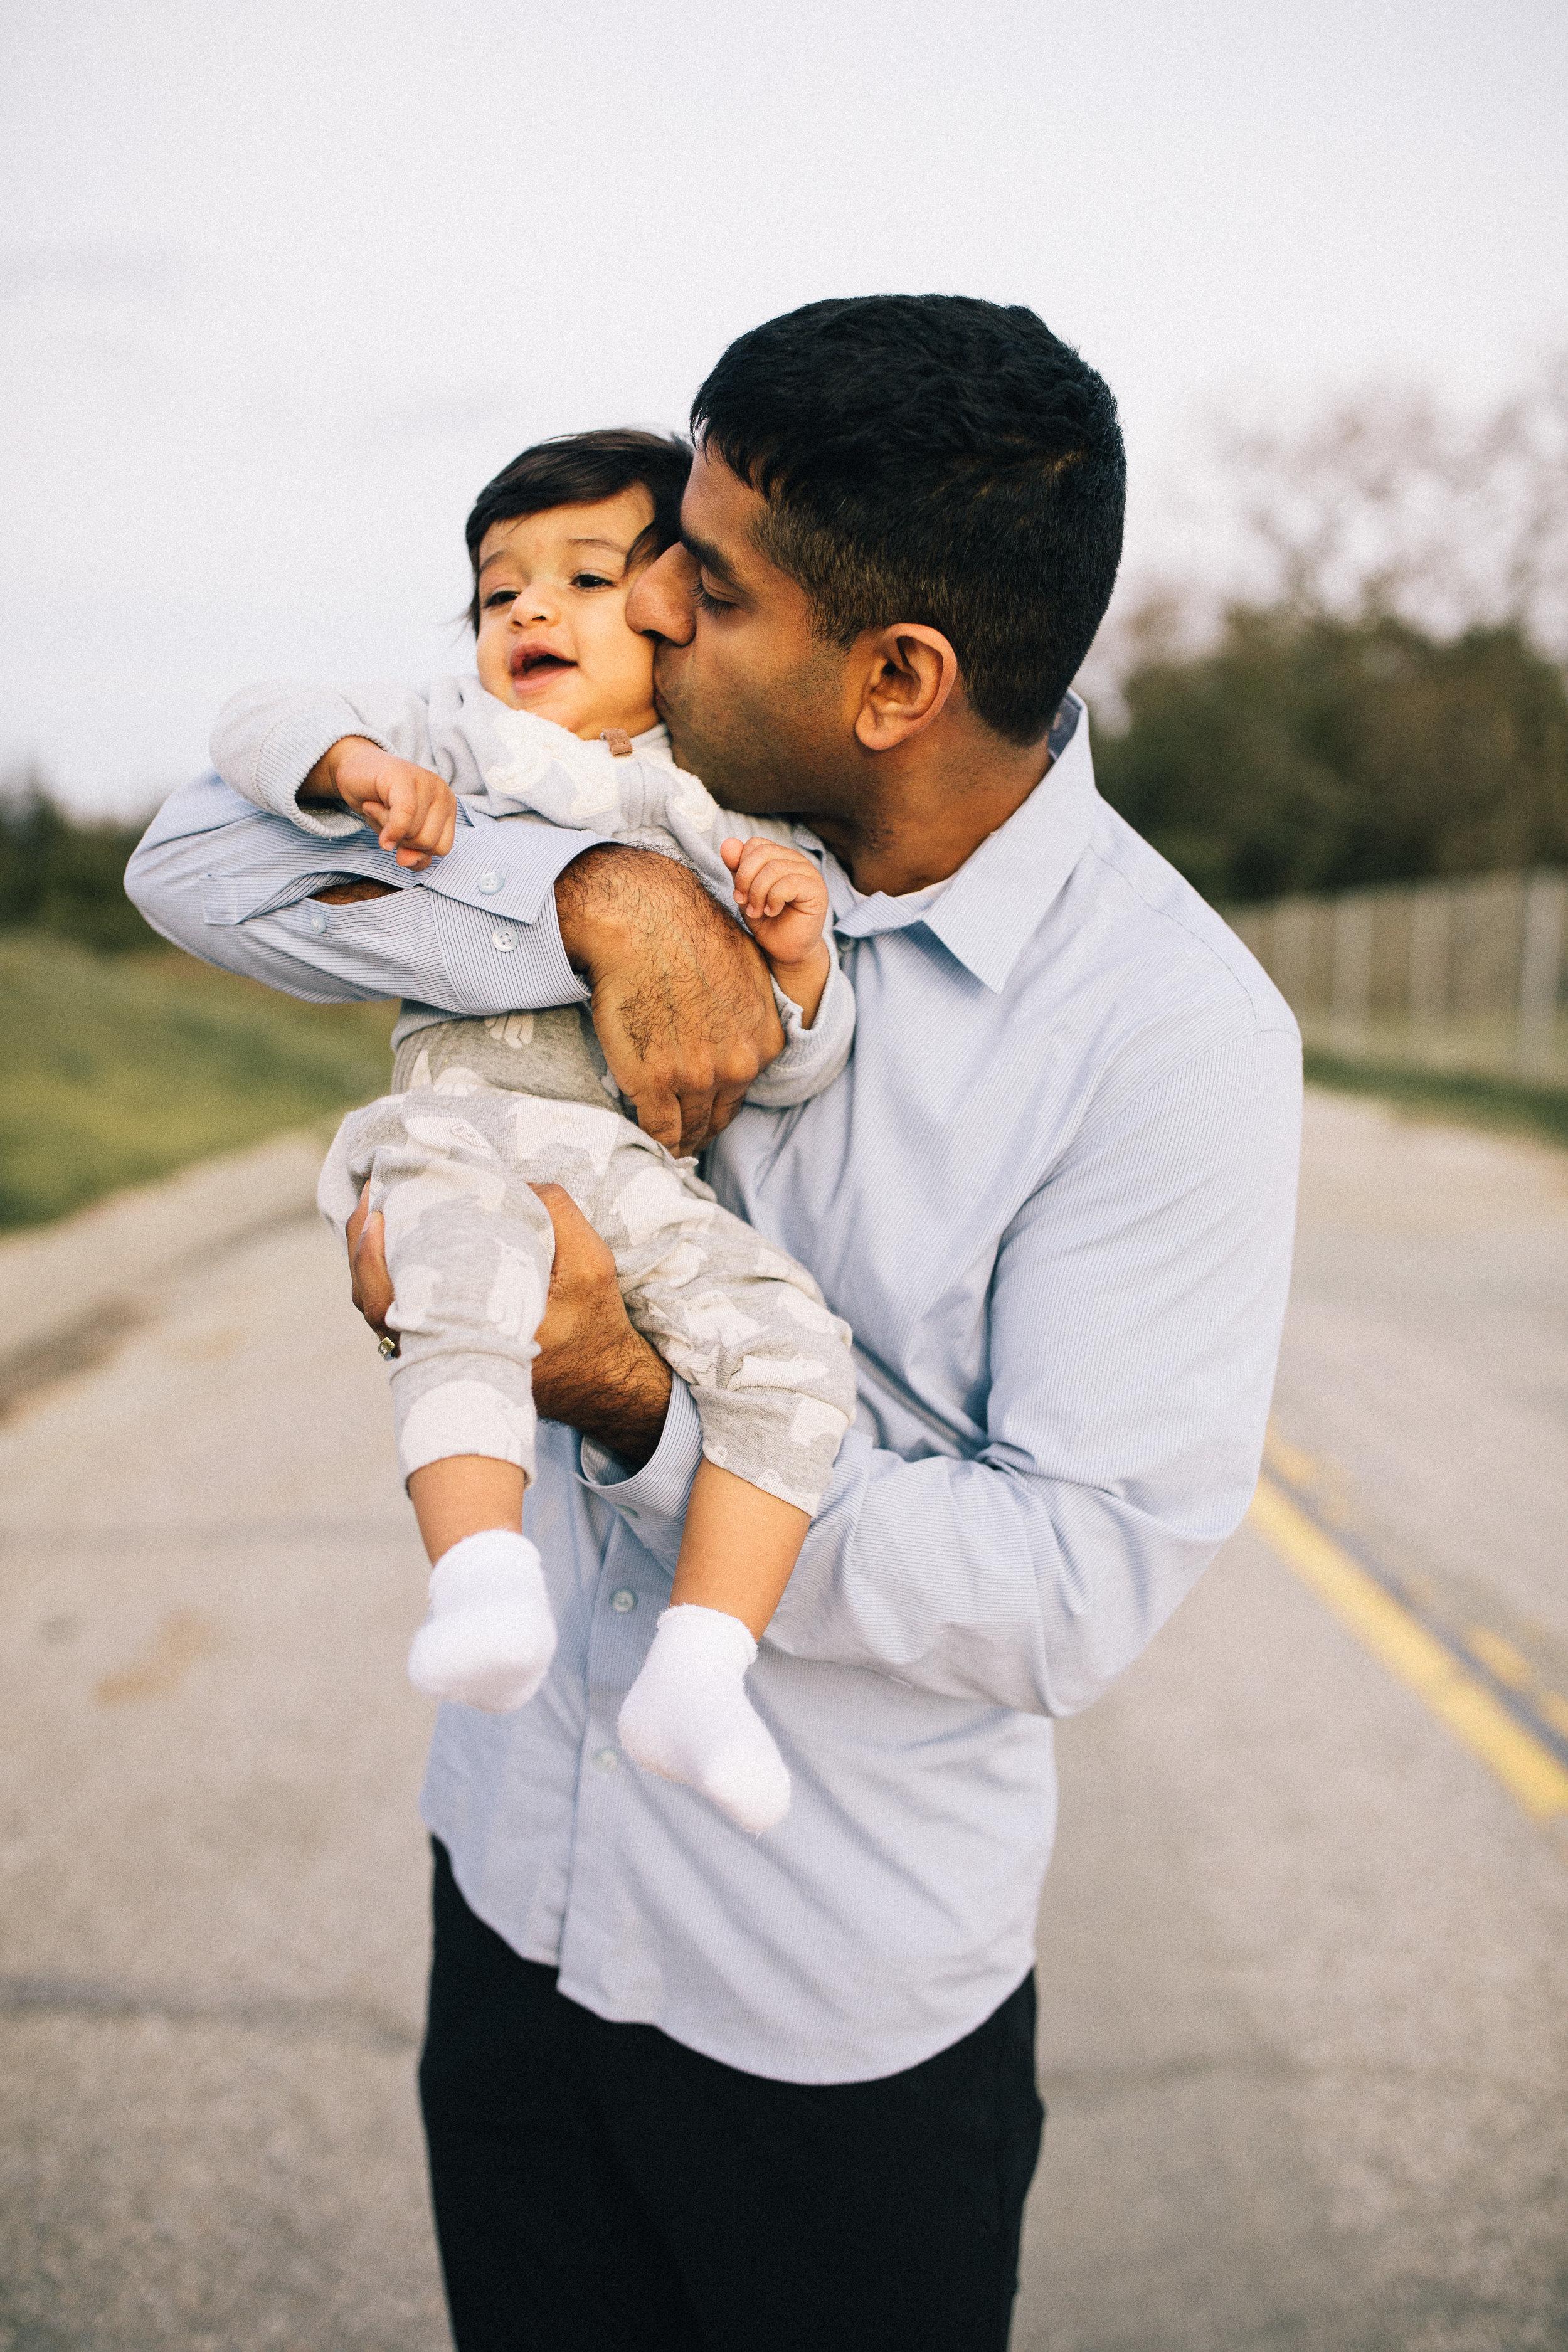 2018_01_01 Ahmad Family Session Blog Photos Edited Full Resolution 0015.jpg